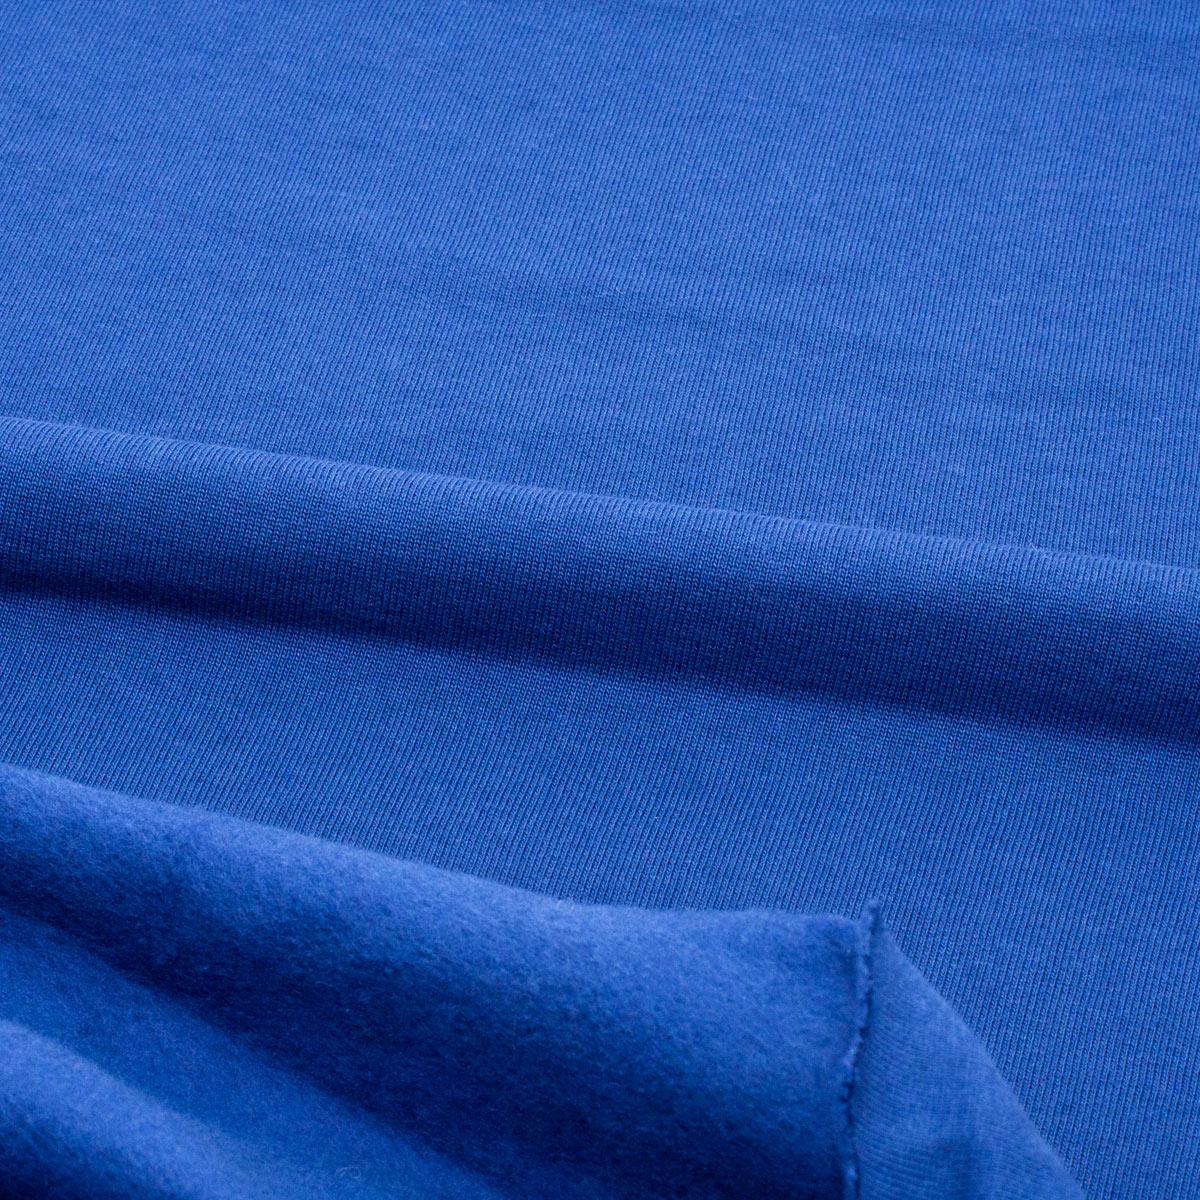 Sweatshirt Stoff – Navy Blau